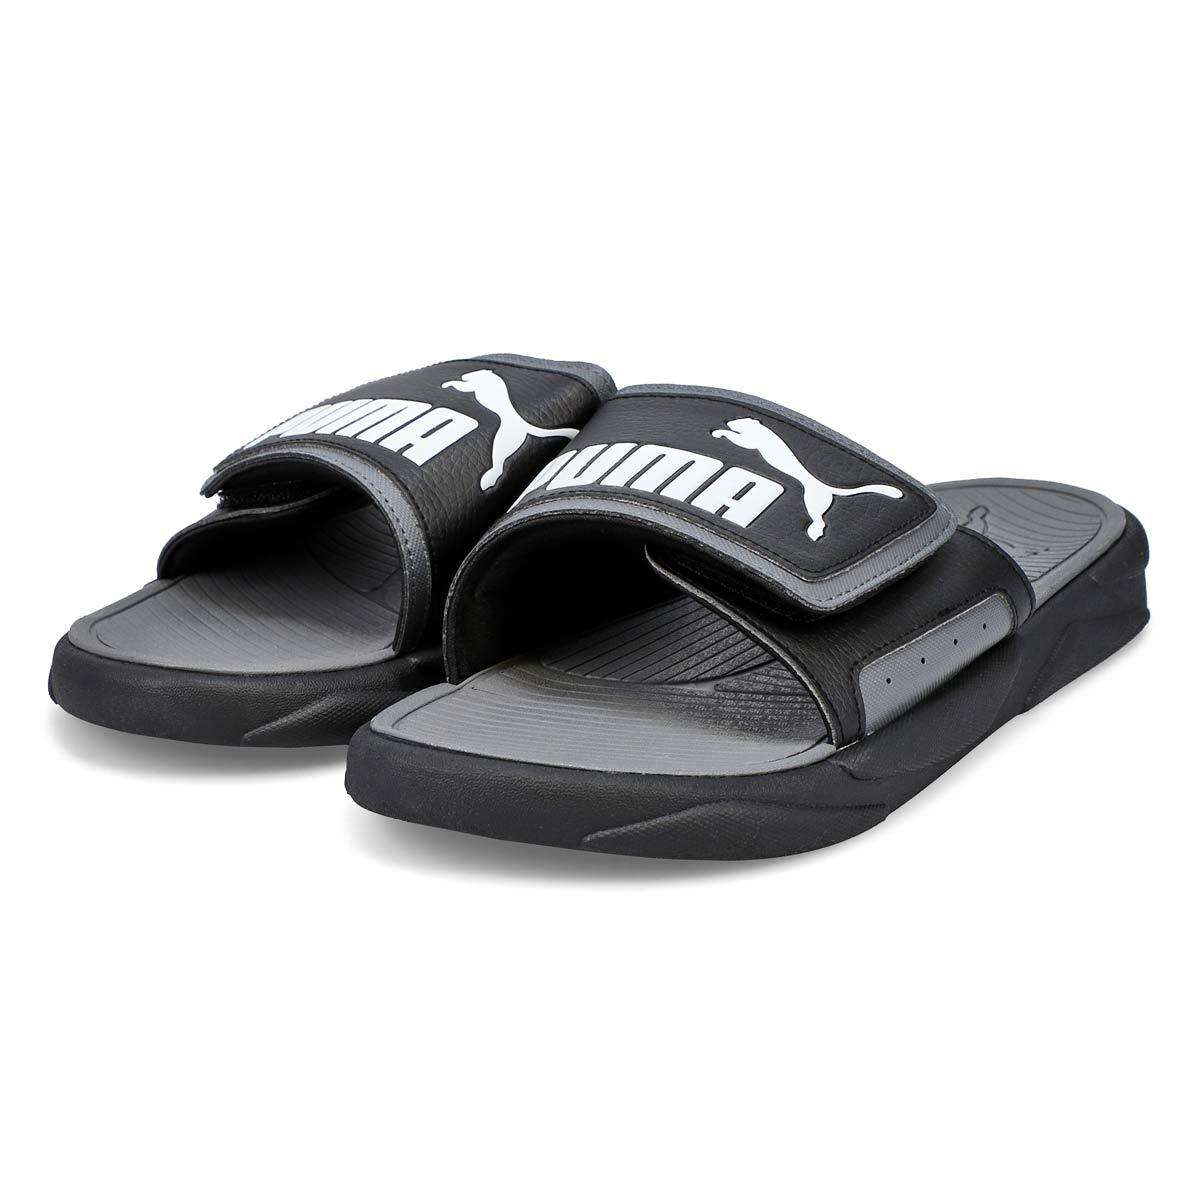 Mens' Royal Cat Sandal - Black/White